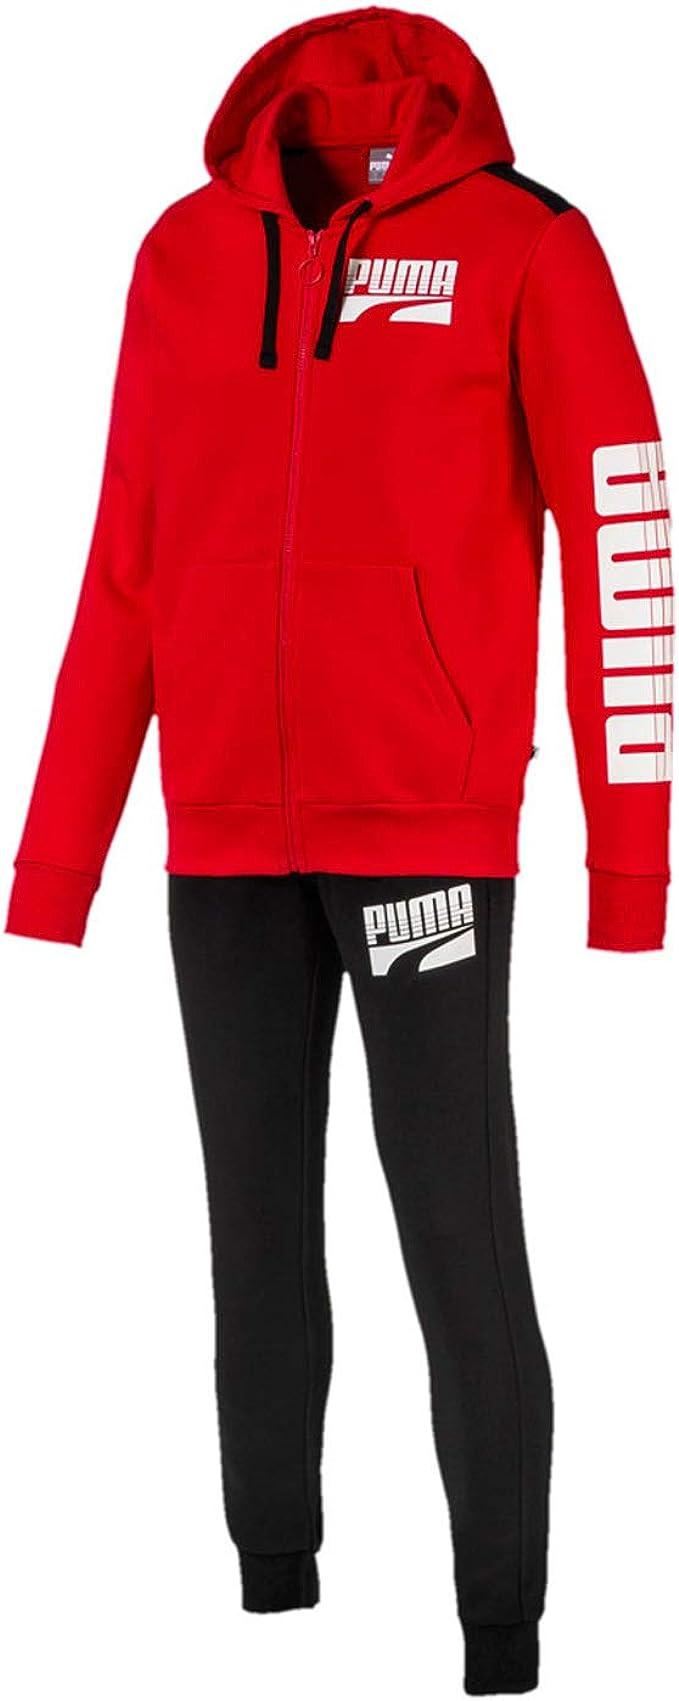 PUMA 580491-11 Suit Men - Chándal para Hombre, Color Rojo ...